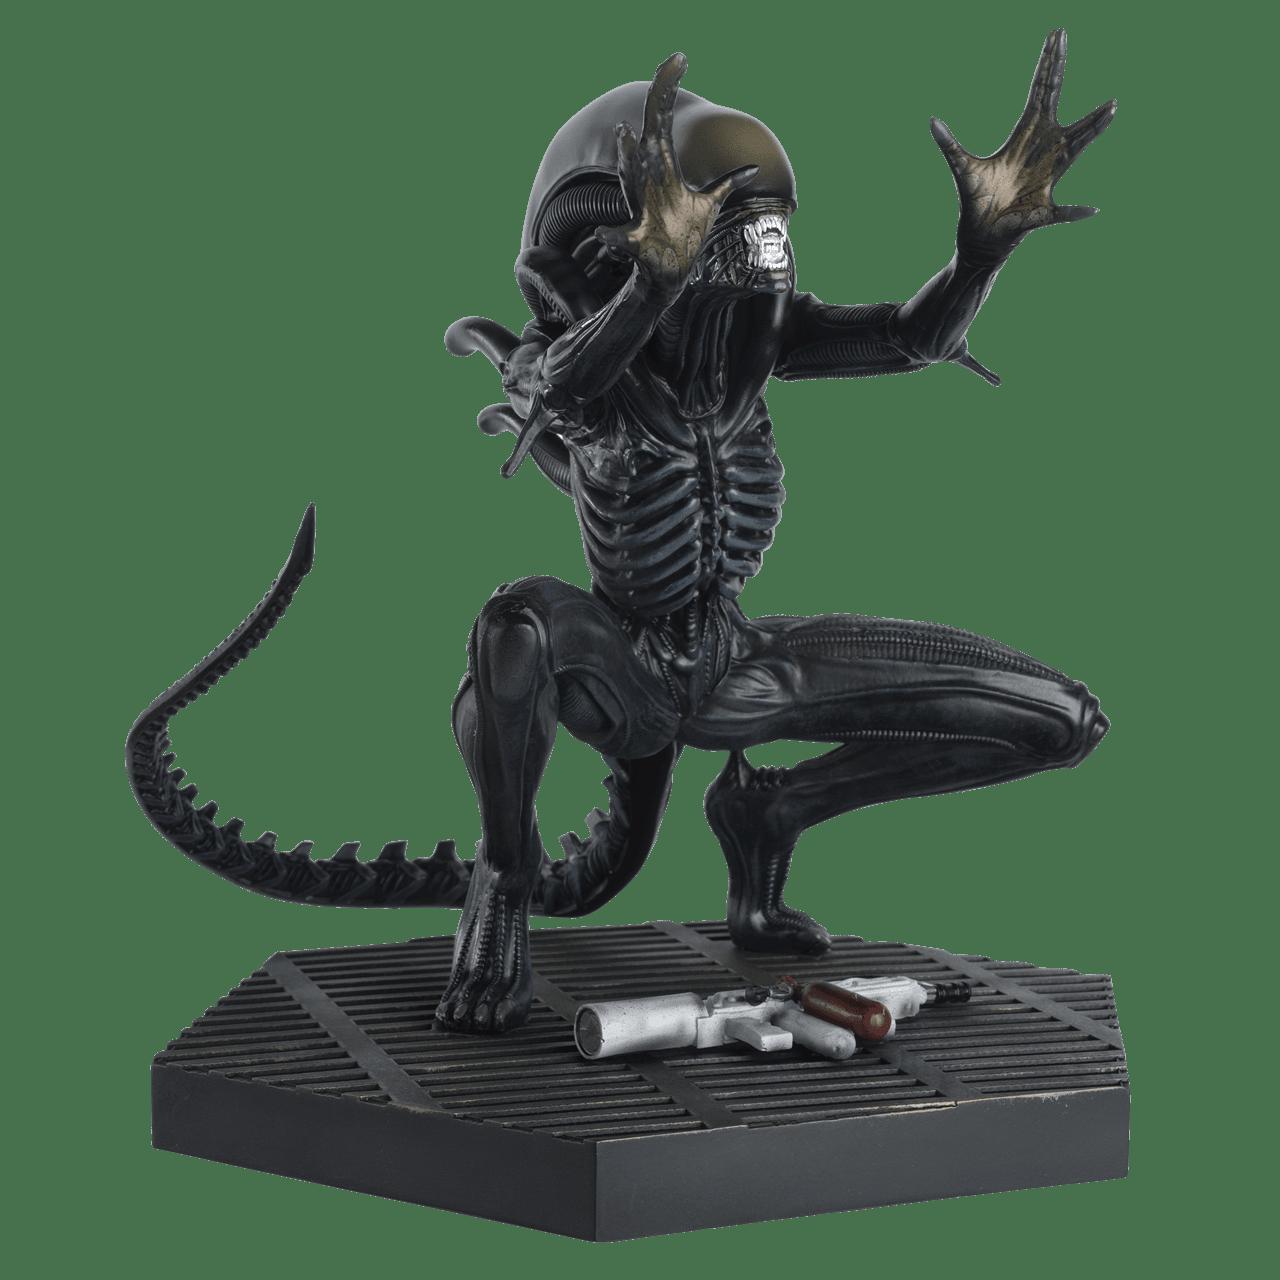 Alien: Vent Attack Mega Figurine: Hero Collector - 2